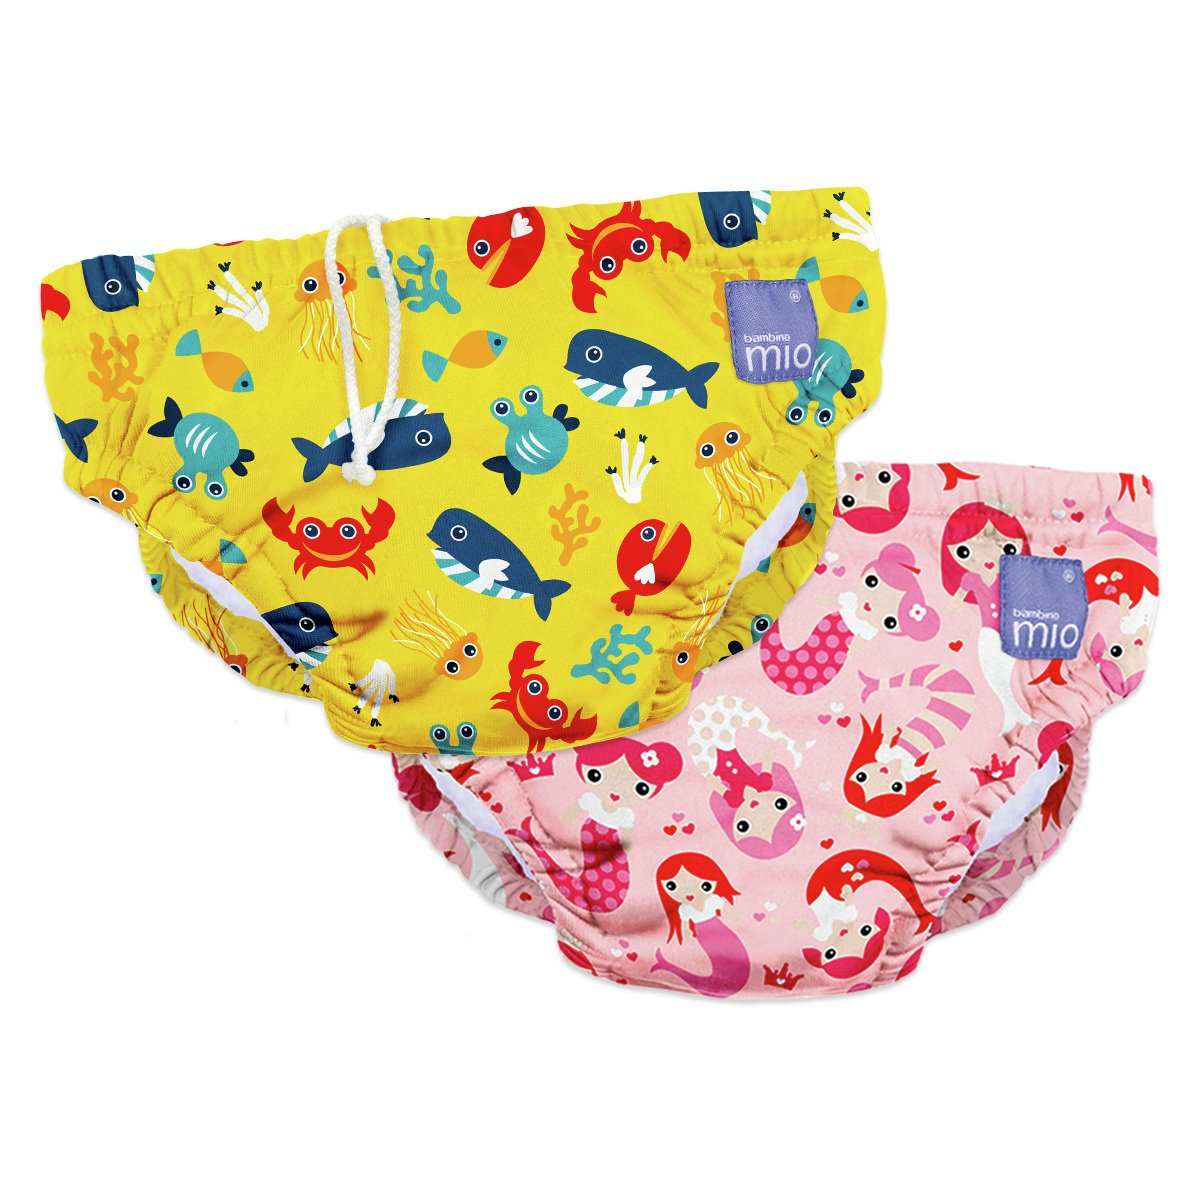 Bambino Mio Reusable Swim Nappy Pink/Yellow - 6-12 Months.